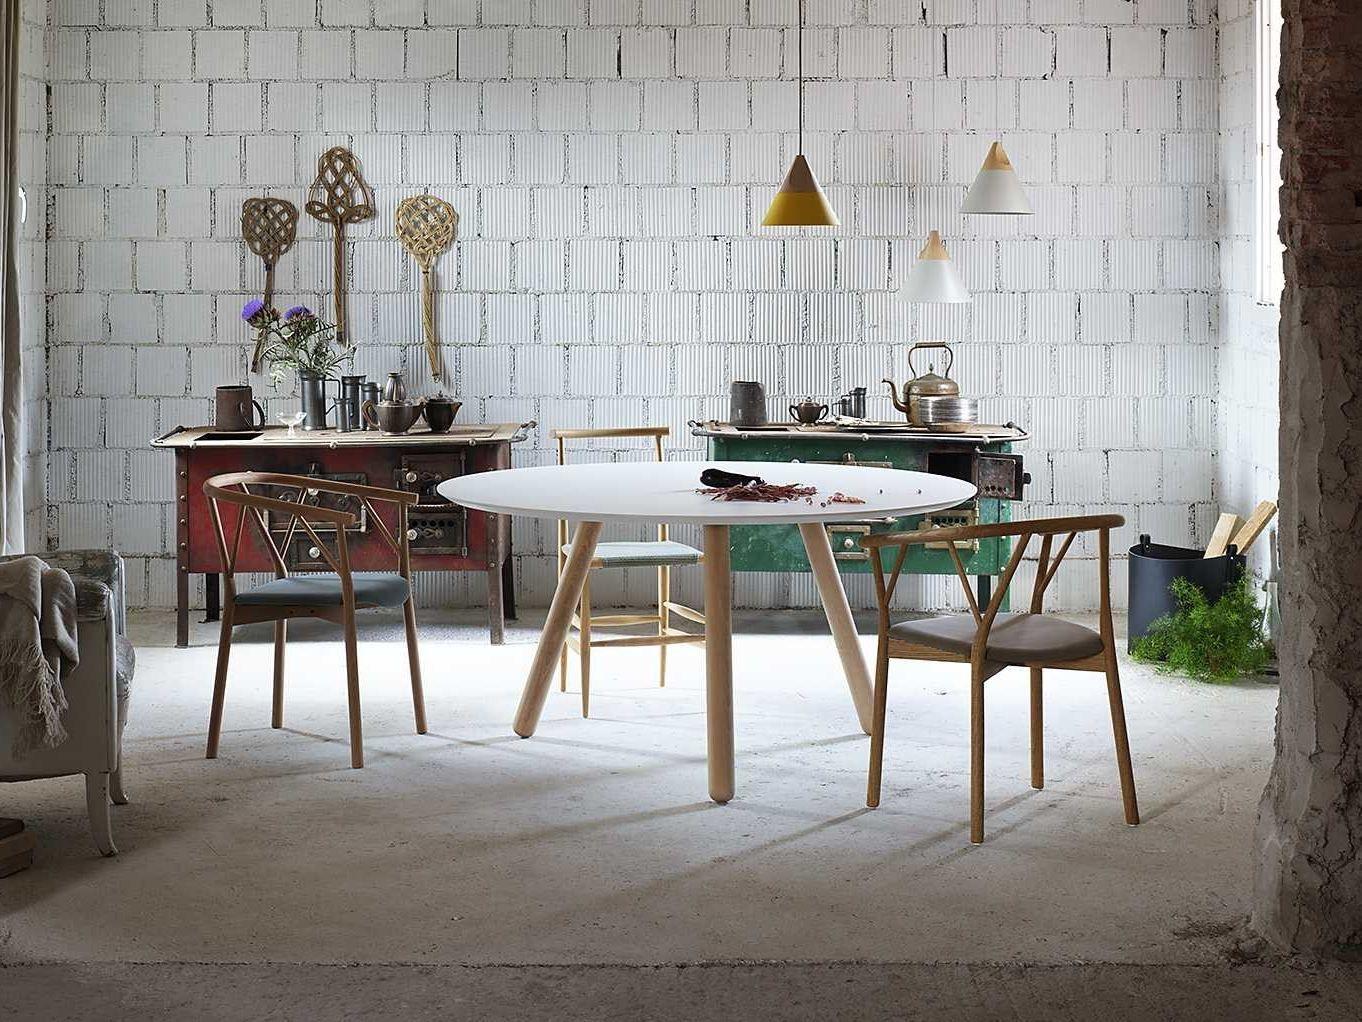 Pixie round table by miniforms design oggimai studio - Salle a manger maison du monde ...